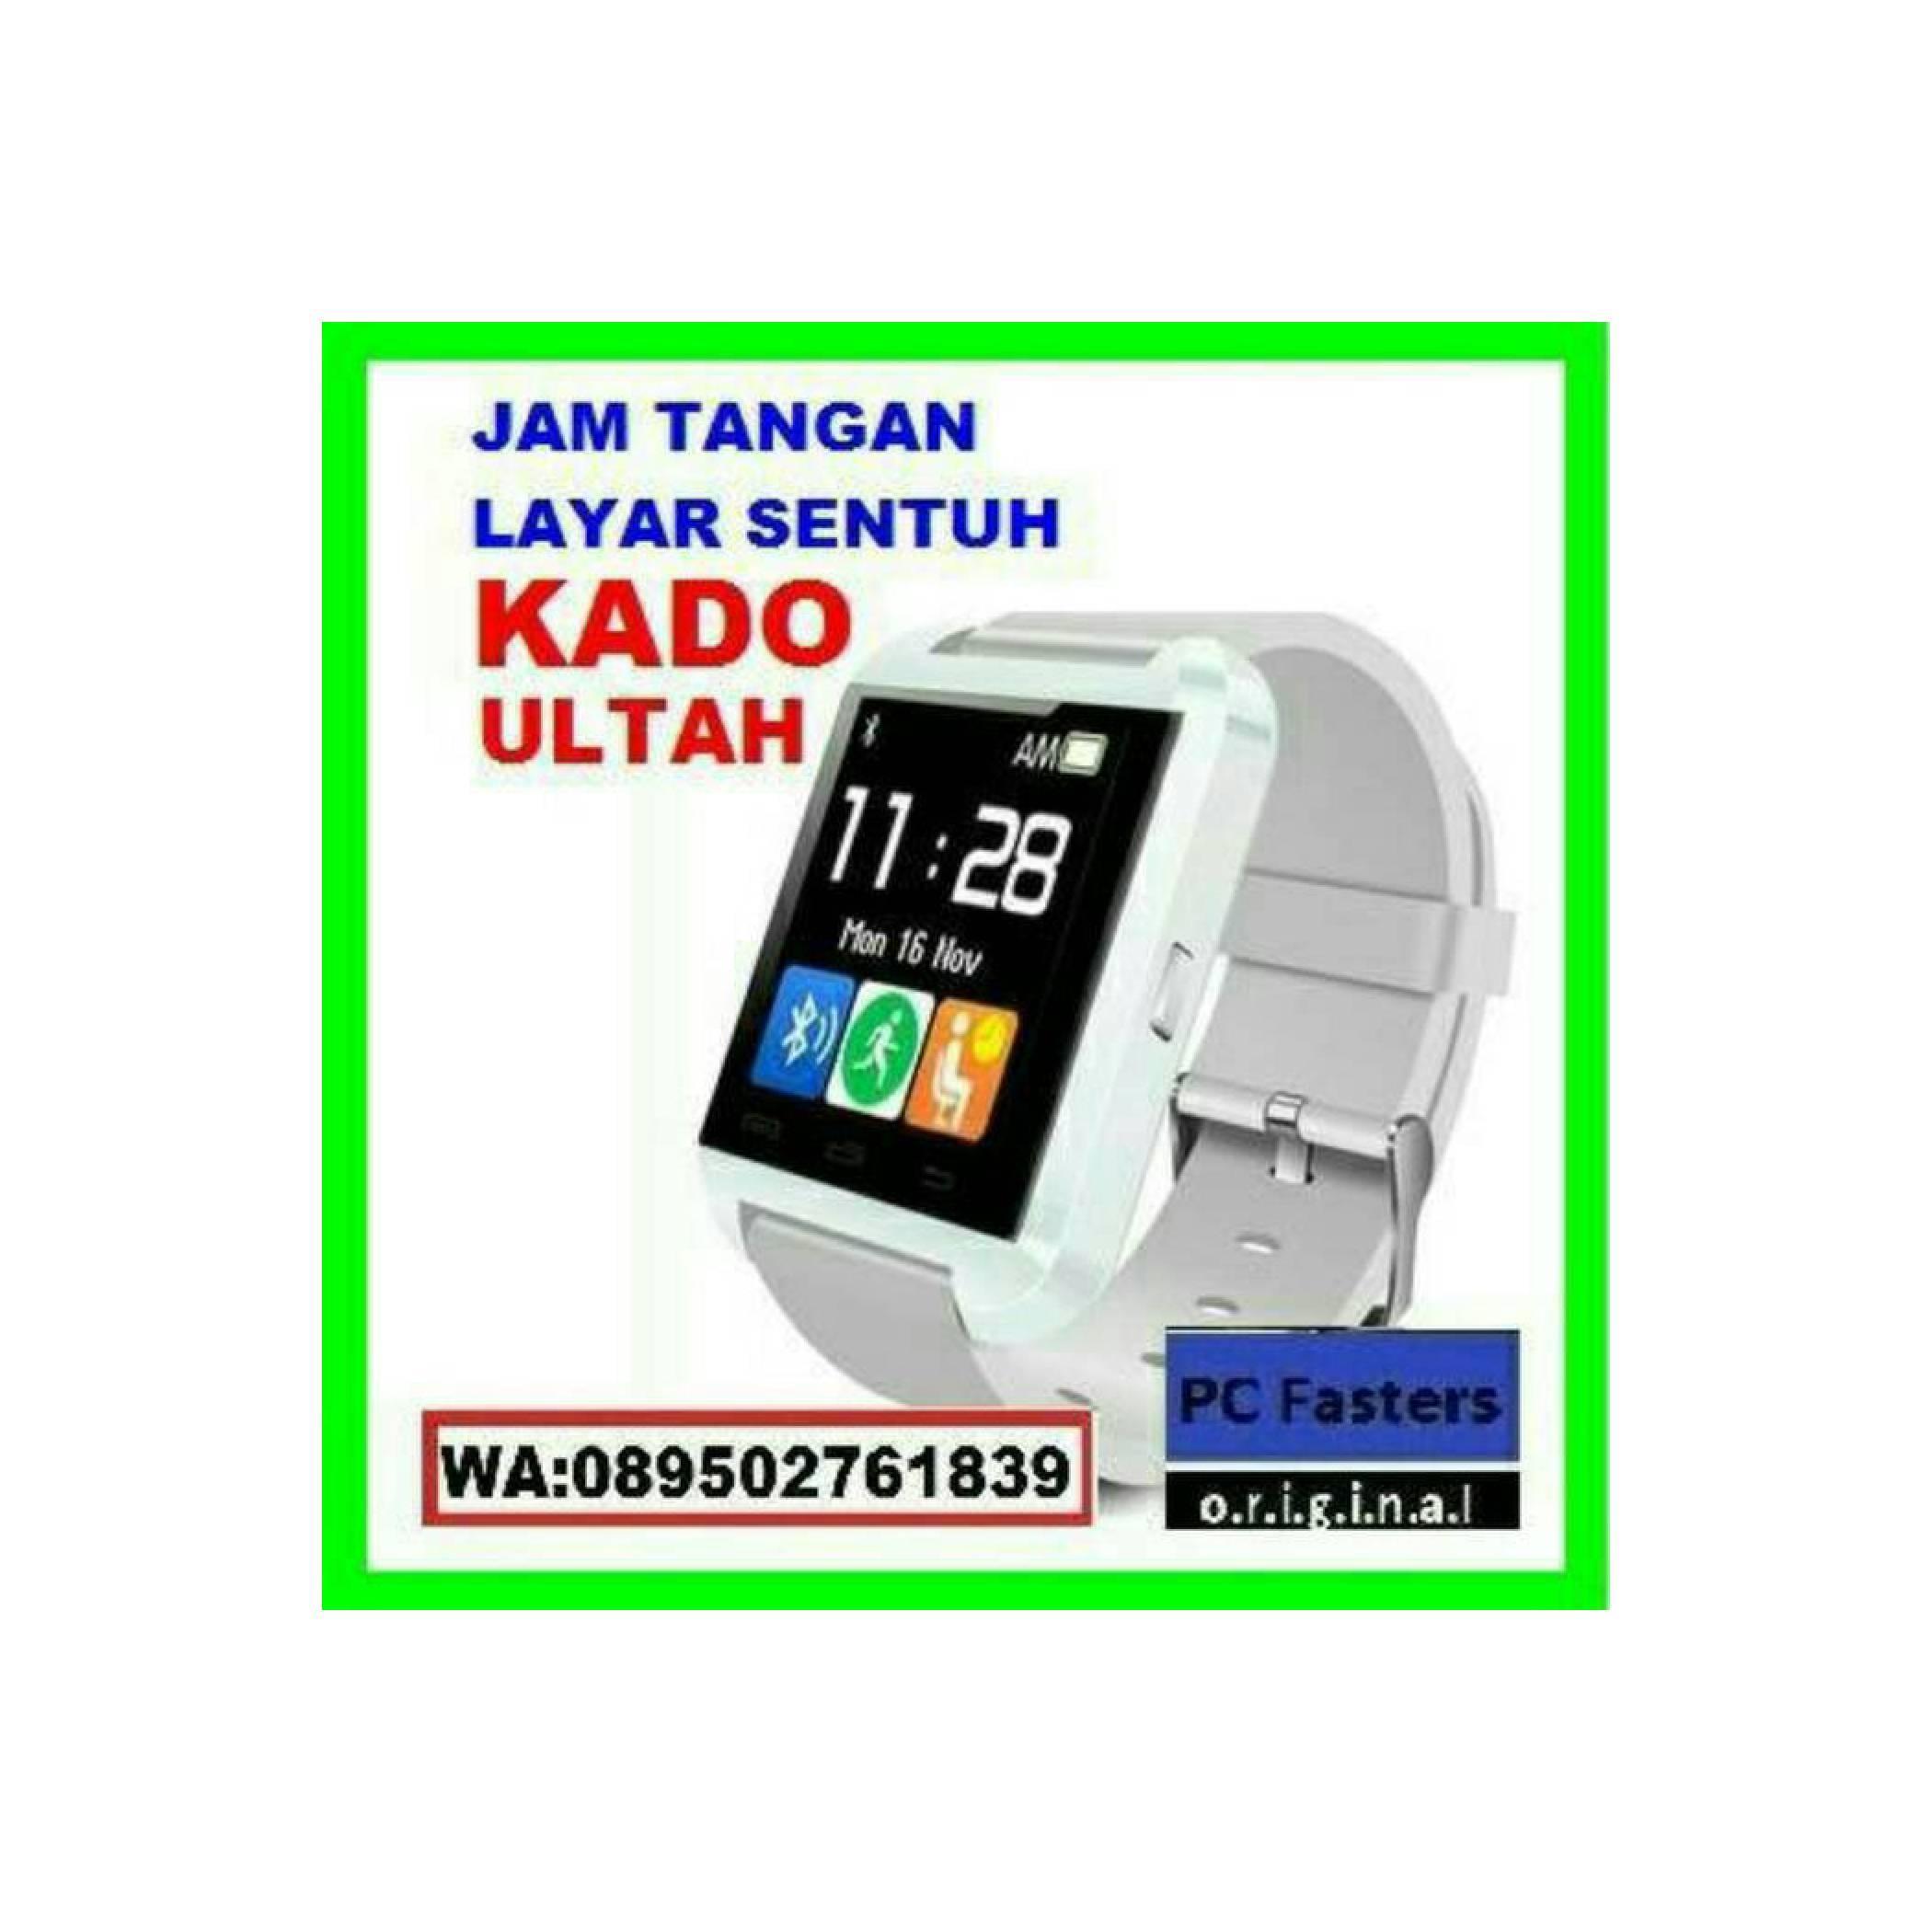 KADO HADIAH SMARTWATCH / HP HANDPHONE JAM TANGAN UNIK XIAOMI SAMSUNG